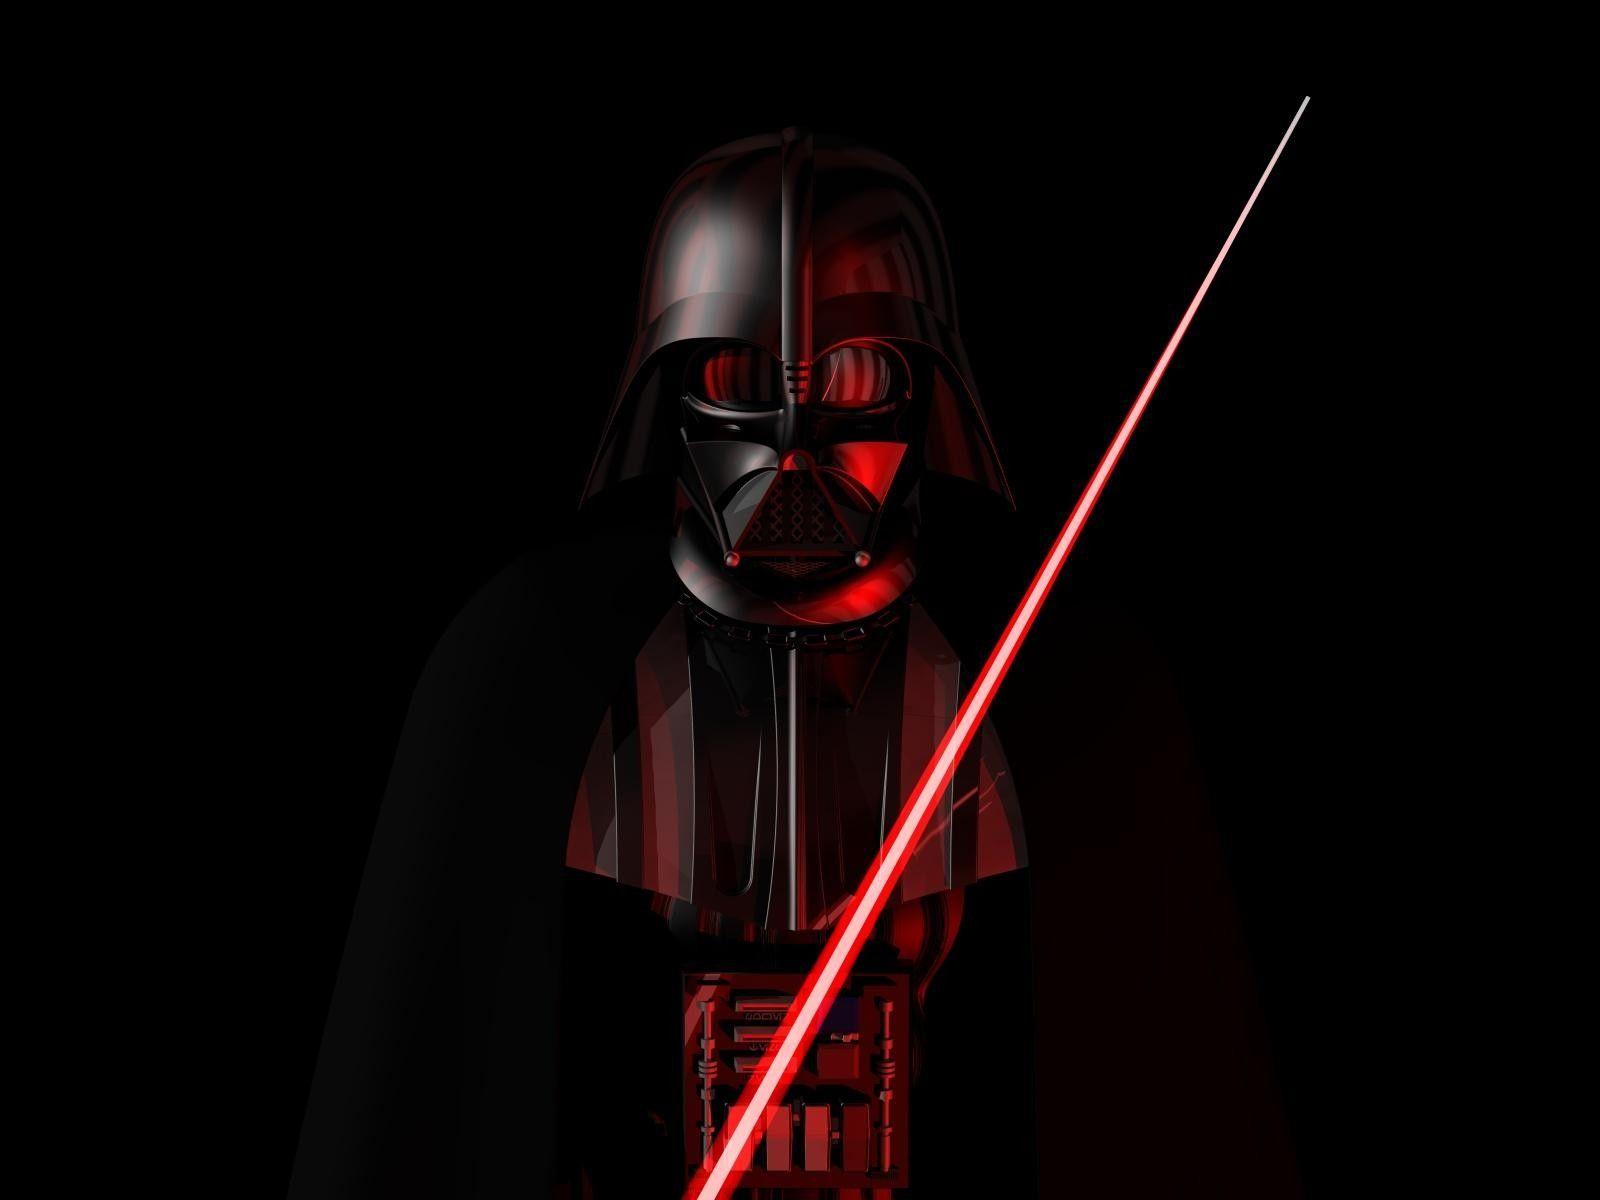 Star Wars Darth Vader Wallpaper For Desktop Fond D Ecran Star Wars Seigneur Sith Illustrations De Star Wars